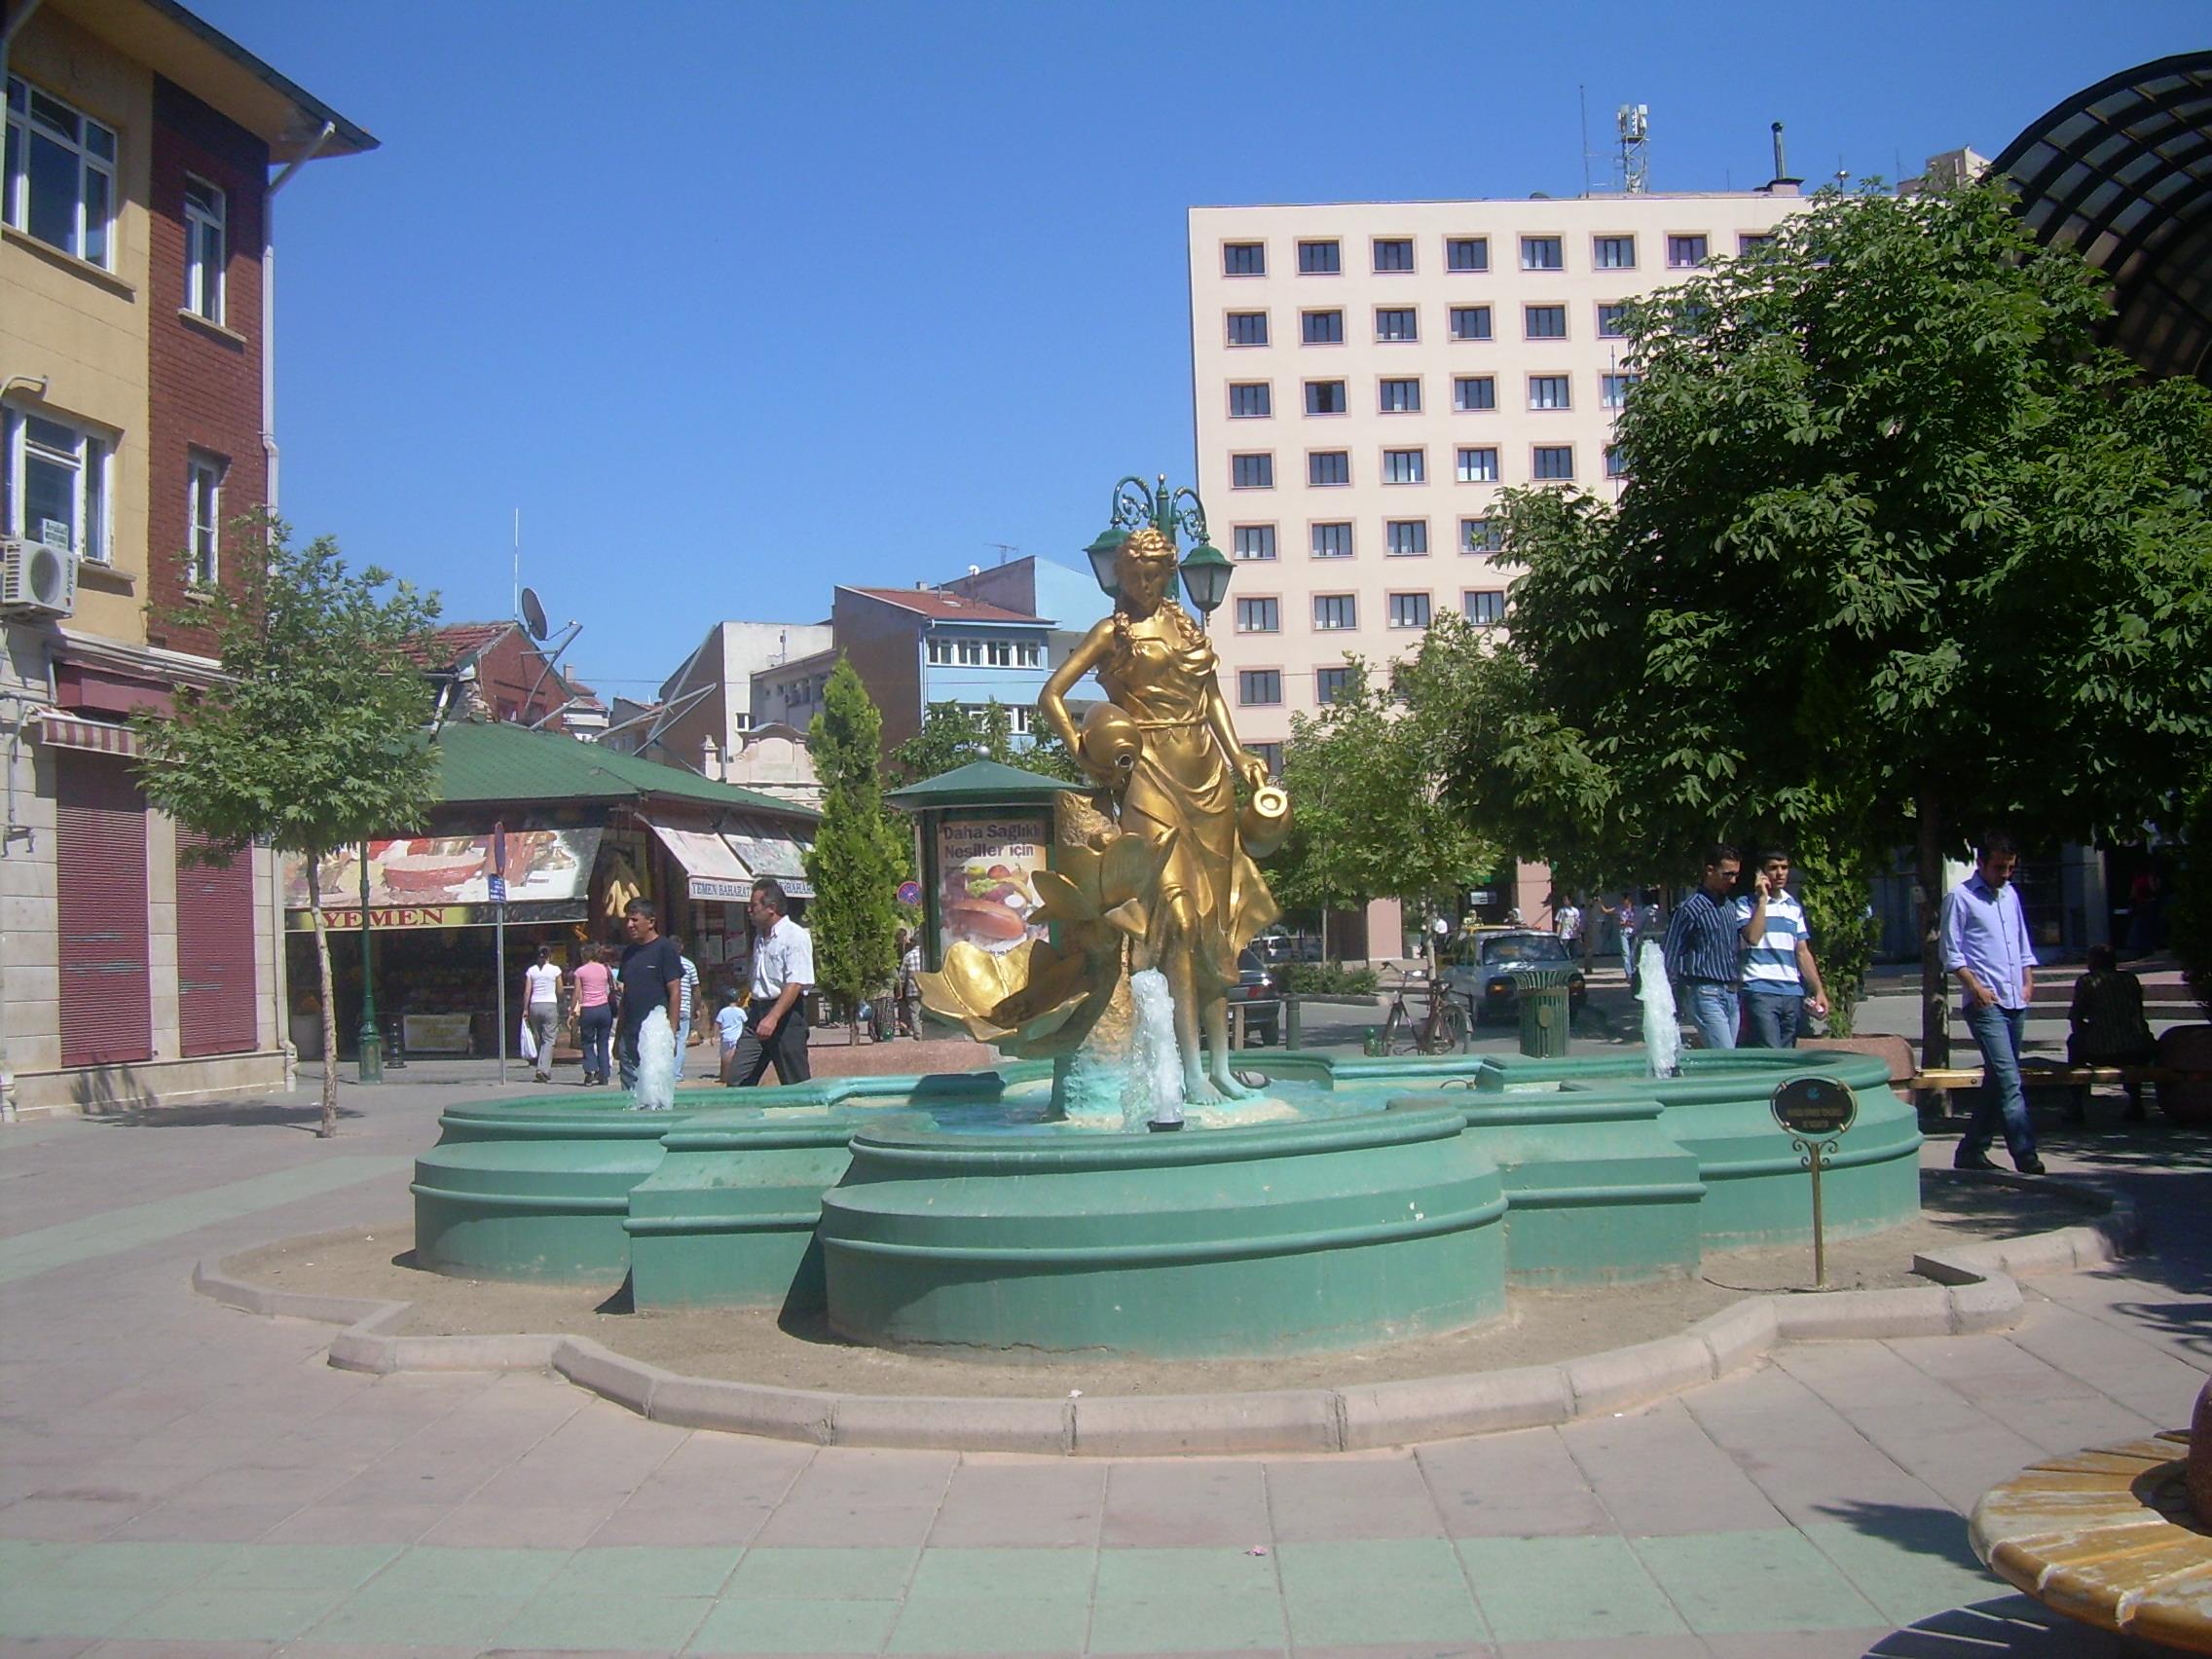 File:Eskişehir Çarşı.jpg - Wikimedia Commons